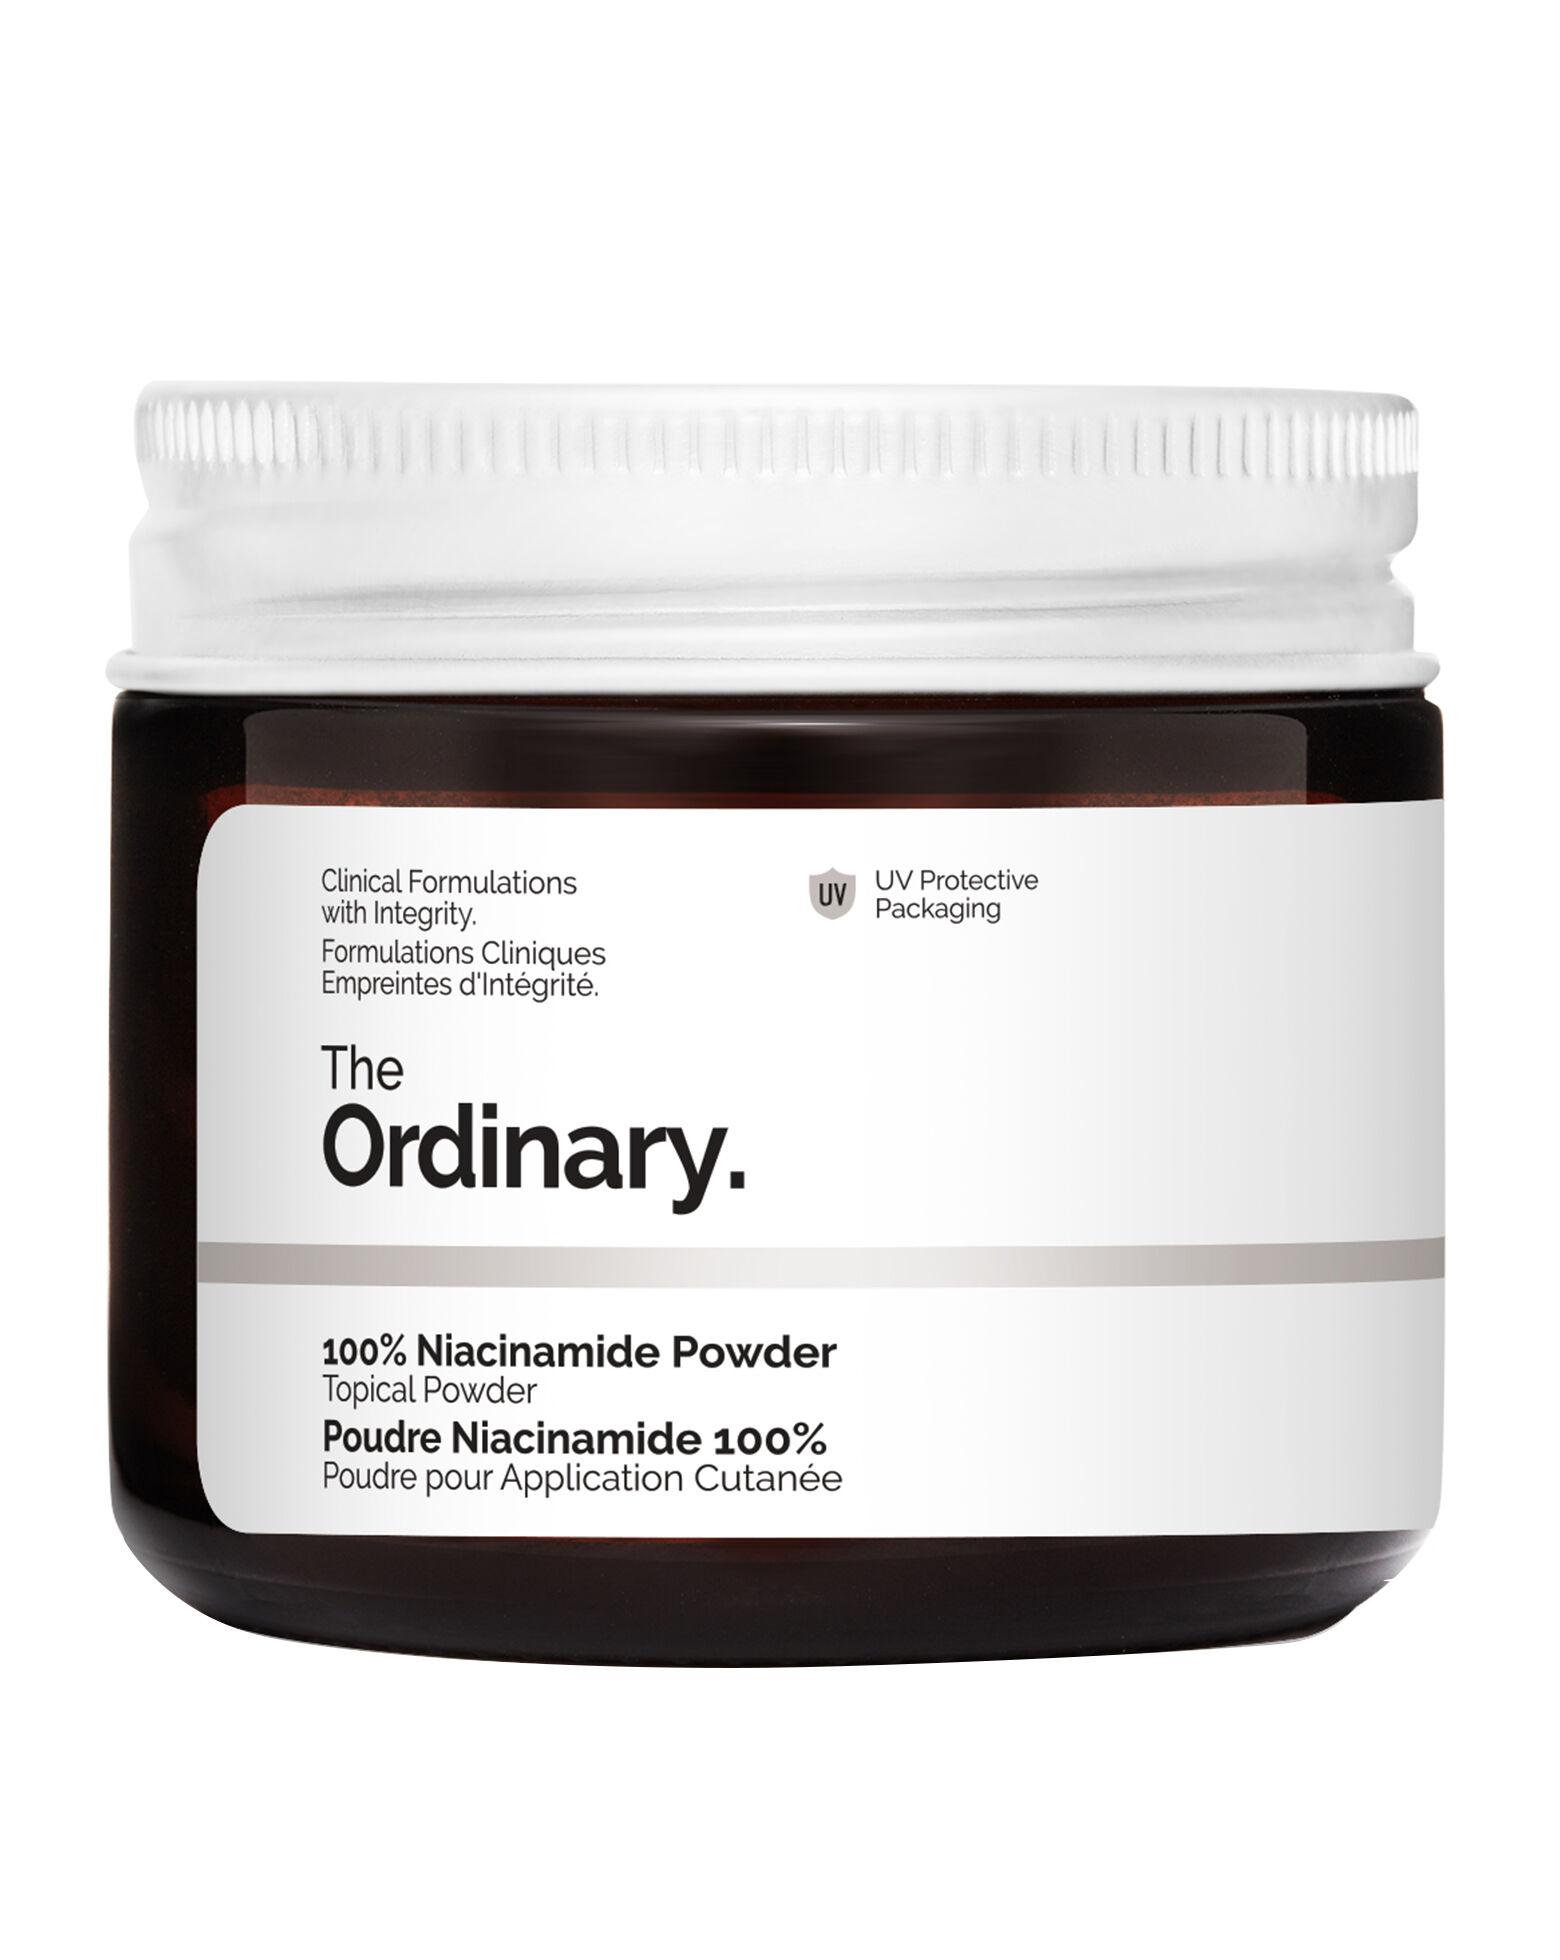 The Ordinary - Niacinamide Powder